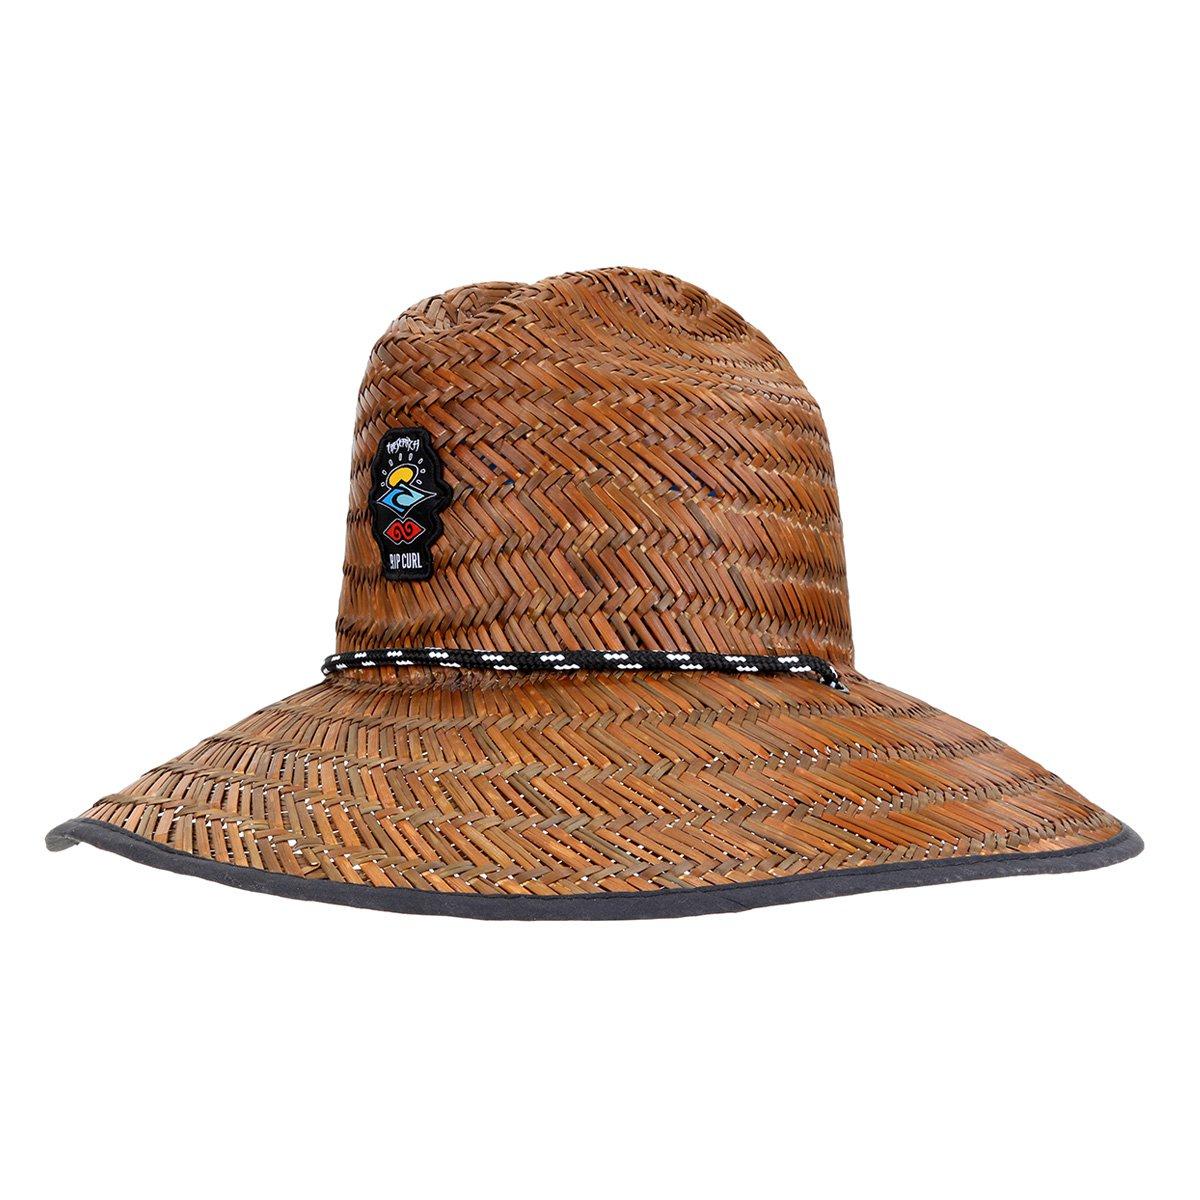 Chapéu de Palha Rip Curl Icons Straw Masculino